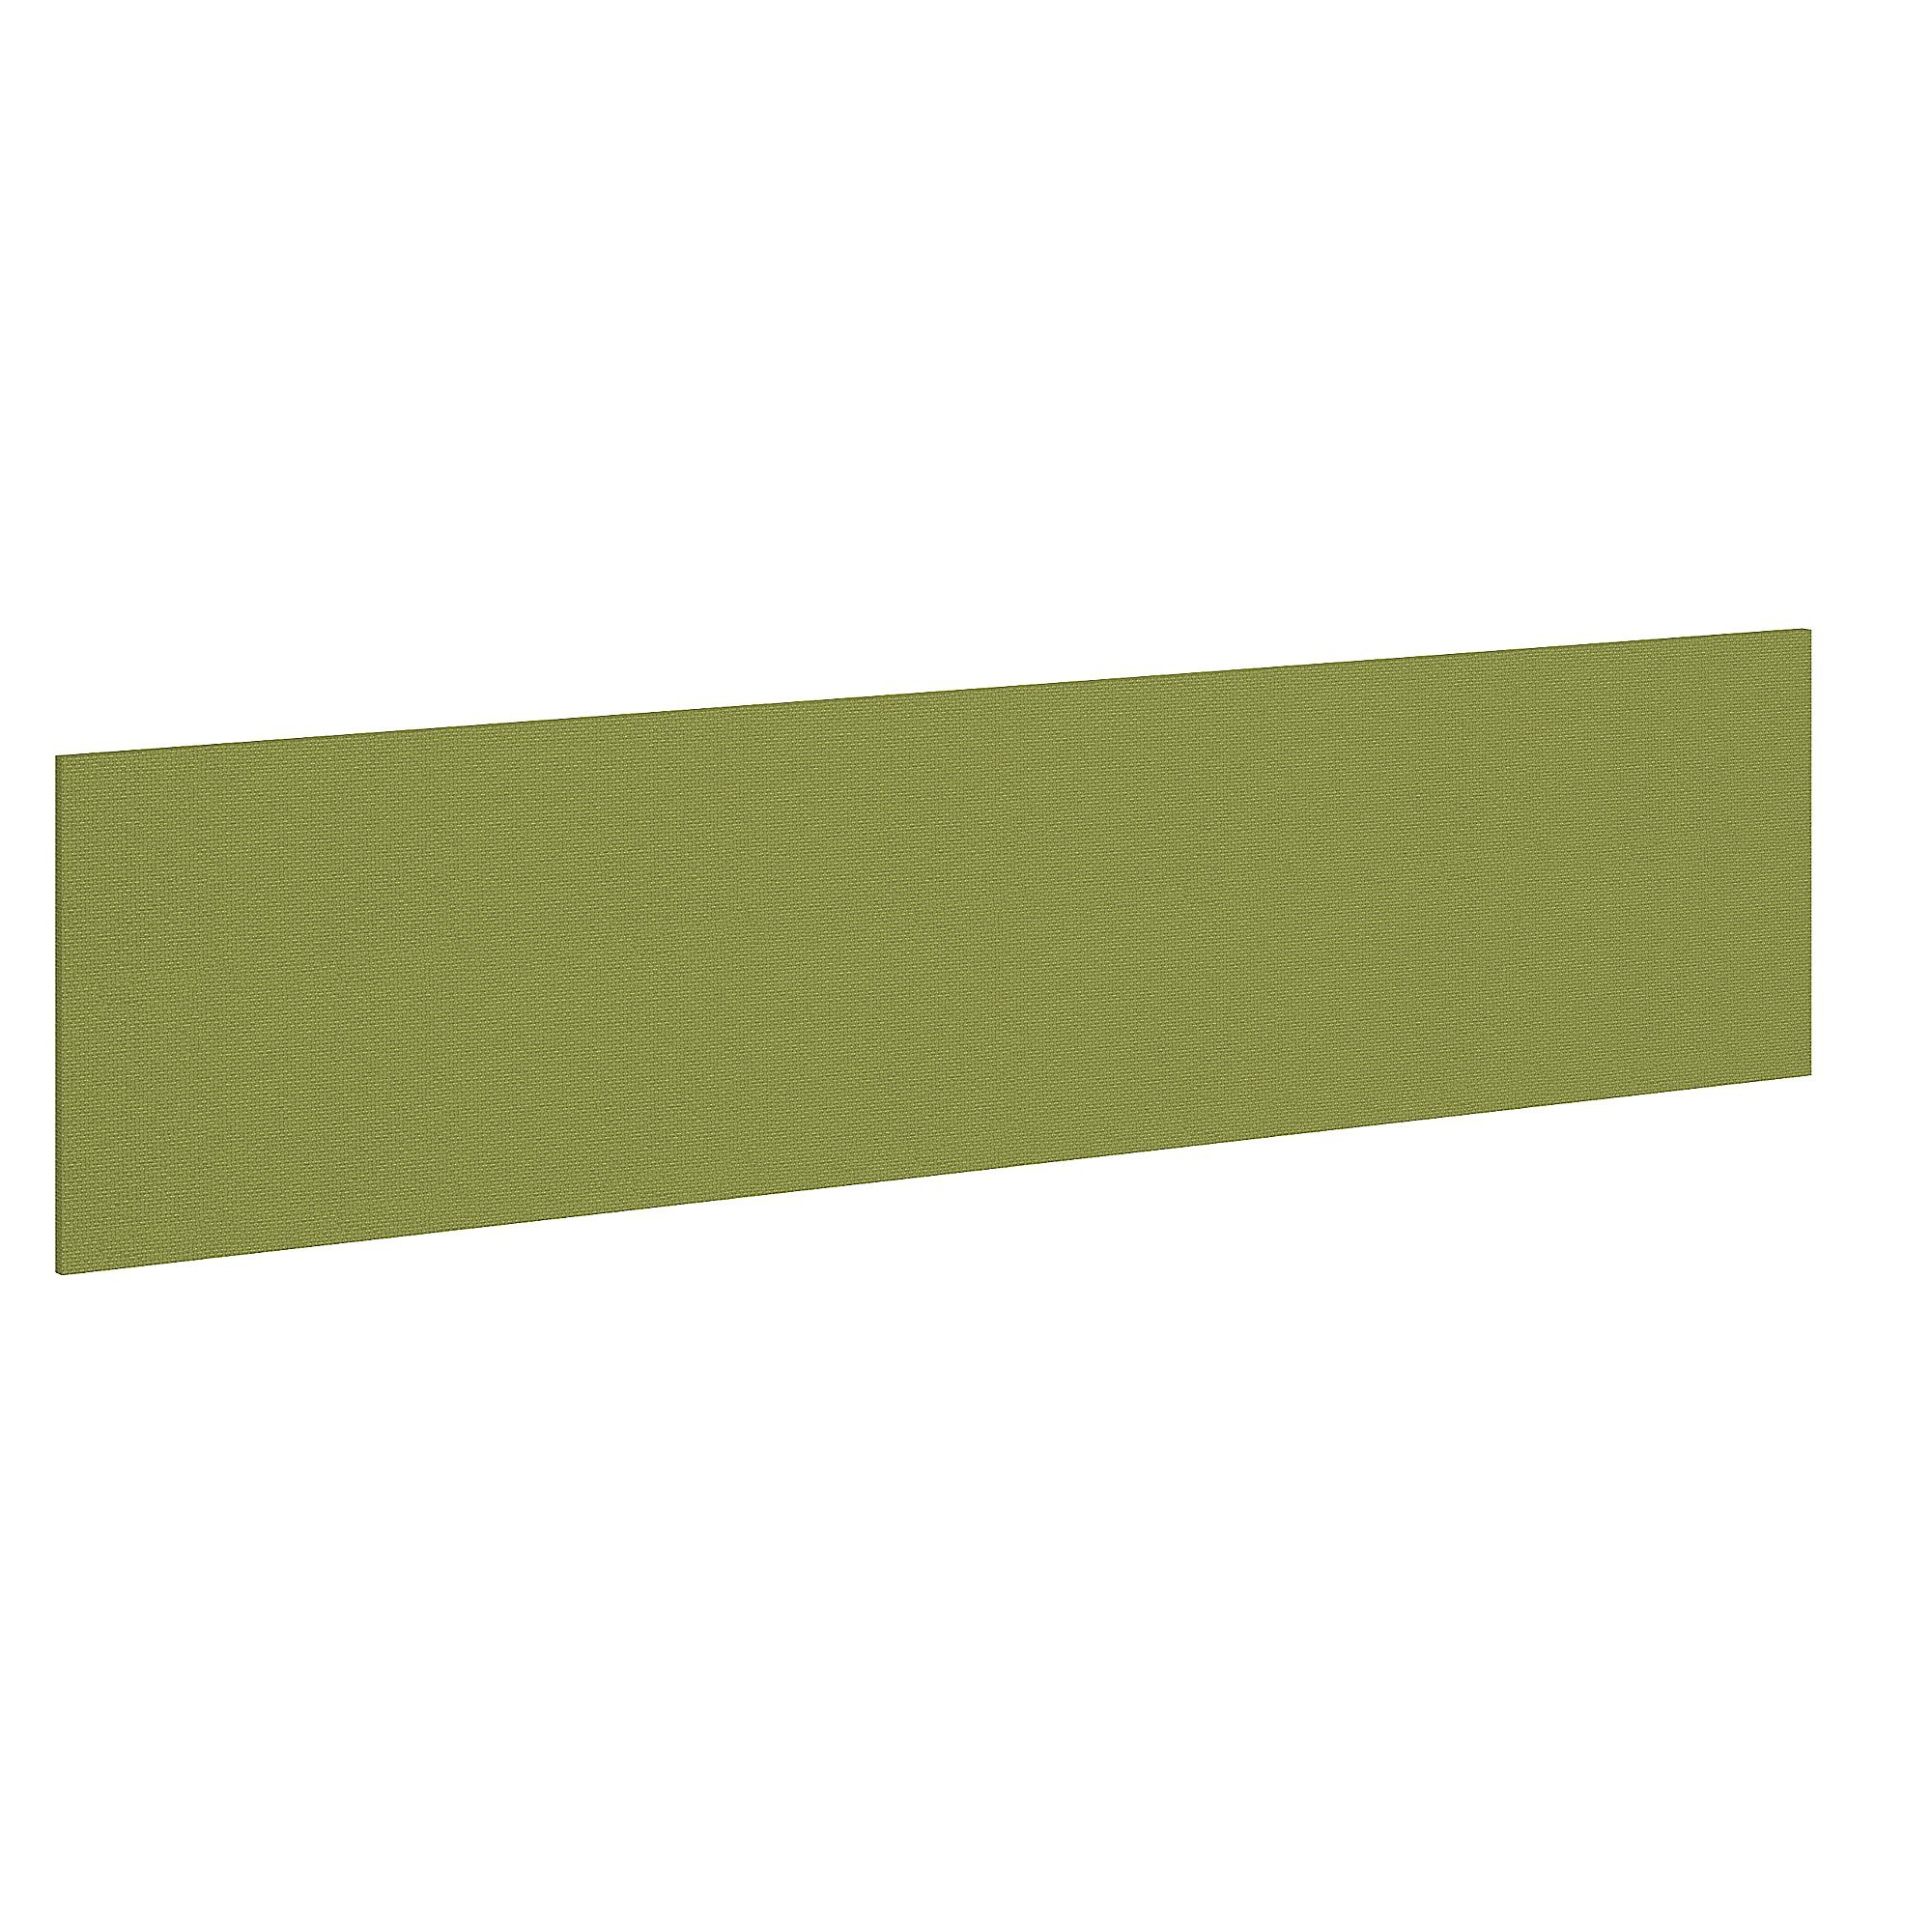 Bush Business Furniture Studio C 72W Tack Board in Lime Green